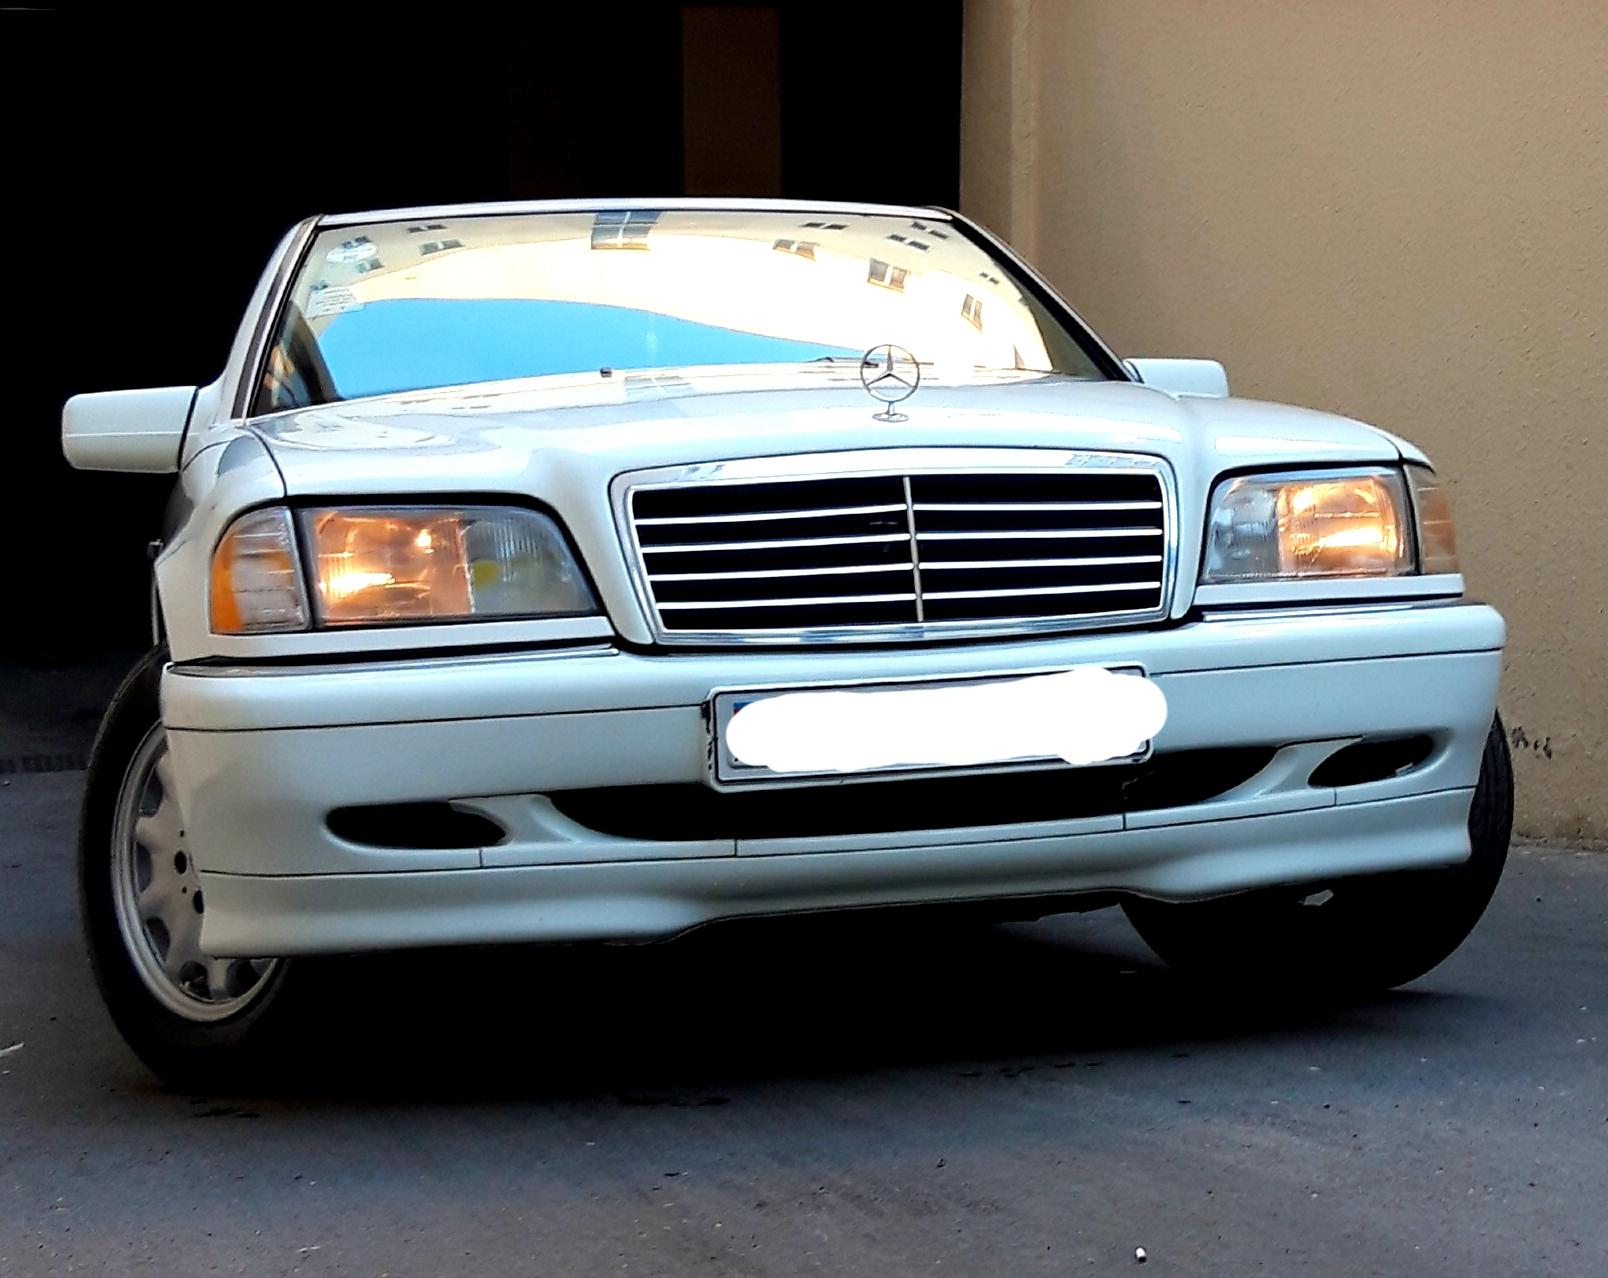 Mercedes-Benz C 230 2.3(lt) 1997 Second hand  $13000